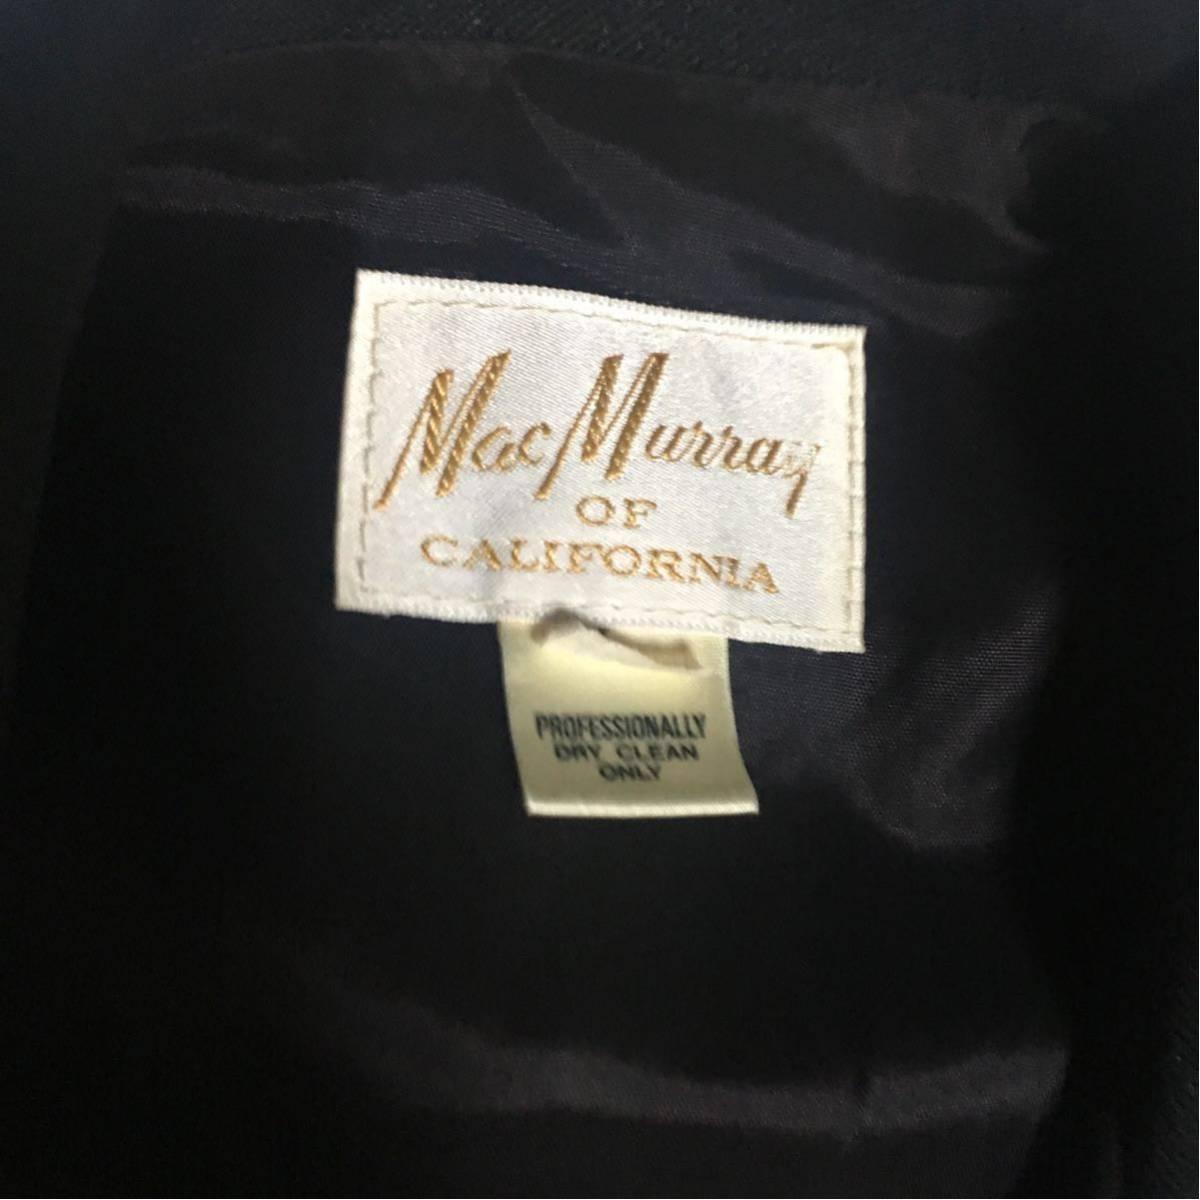 mac murray ウエスタン ジャケット ブルゾン ビンテージ 50s hbarc ギャバ ギャバジャン レーヨン ジョニーデップ レア 希少 ヴィンテージ _画像2